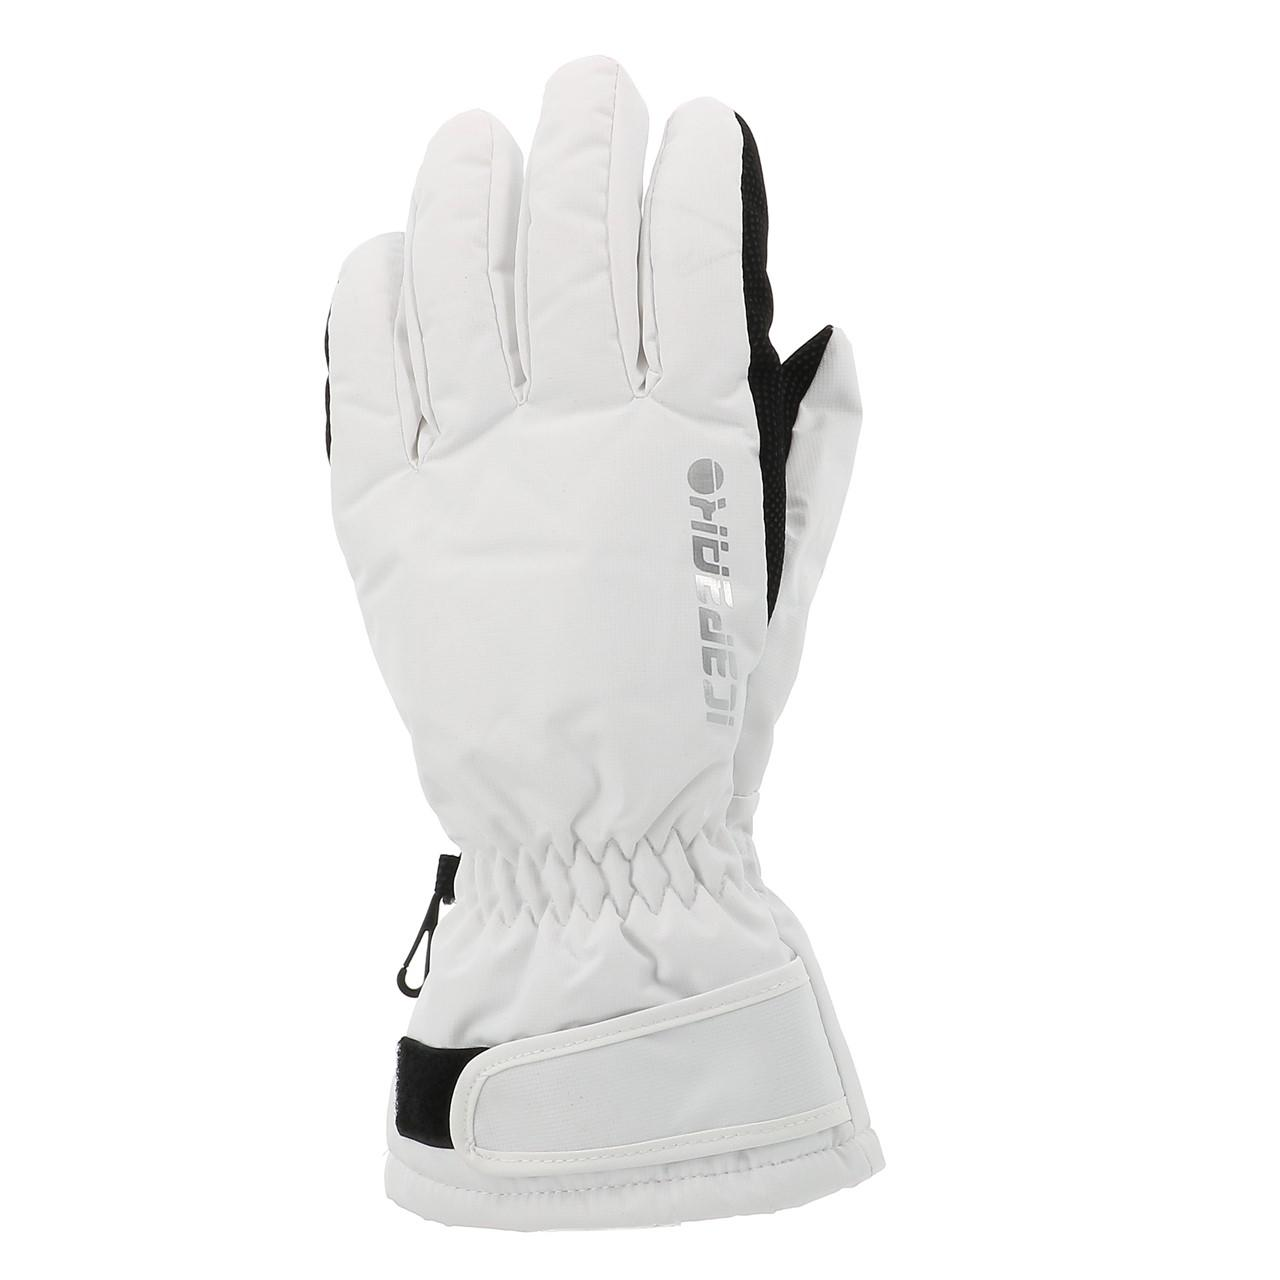 Gants-de-ski-Icepeak-Diisa-blanc-gants-ski-l-Blanc-14370-Neuf